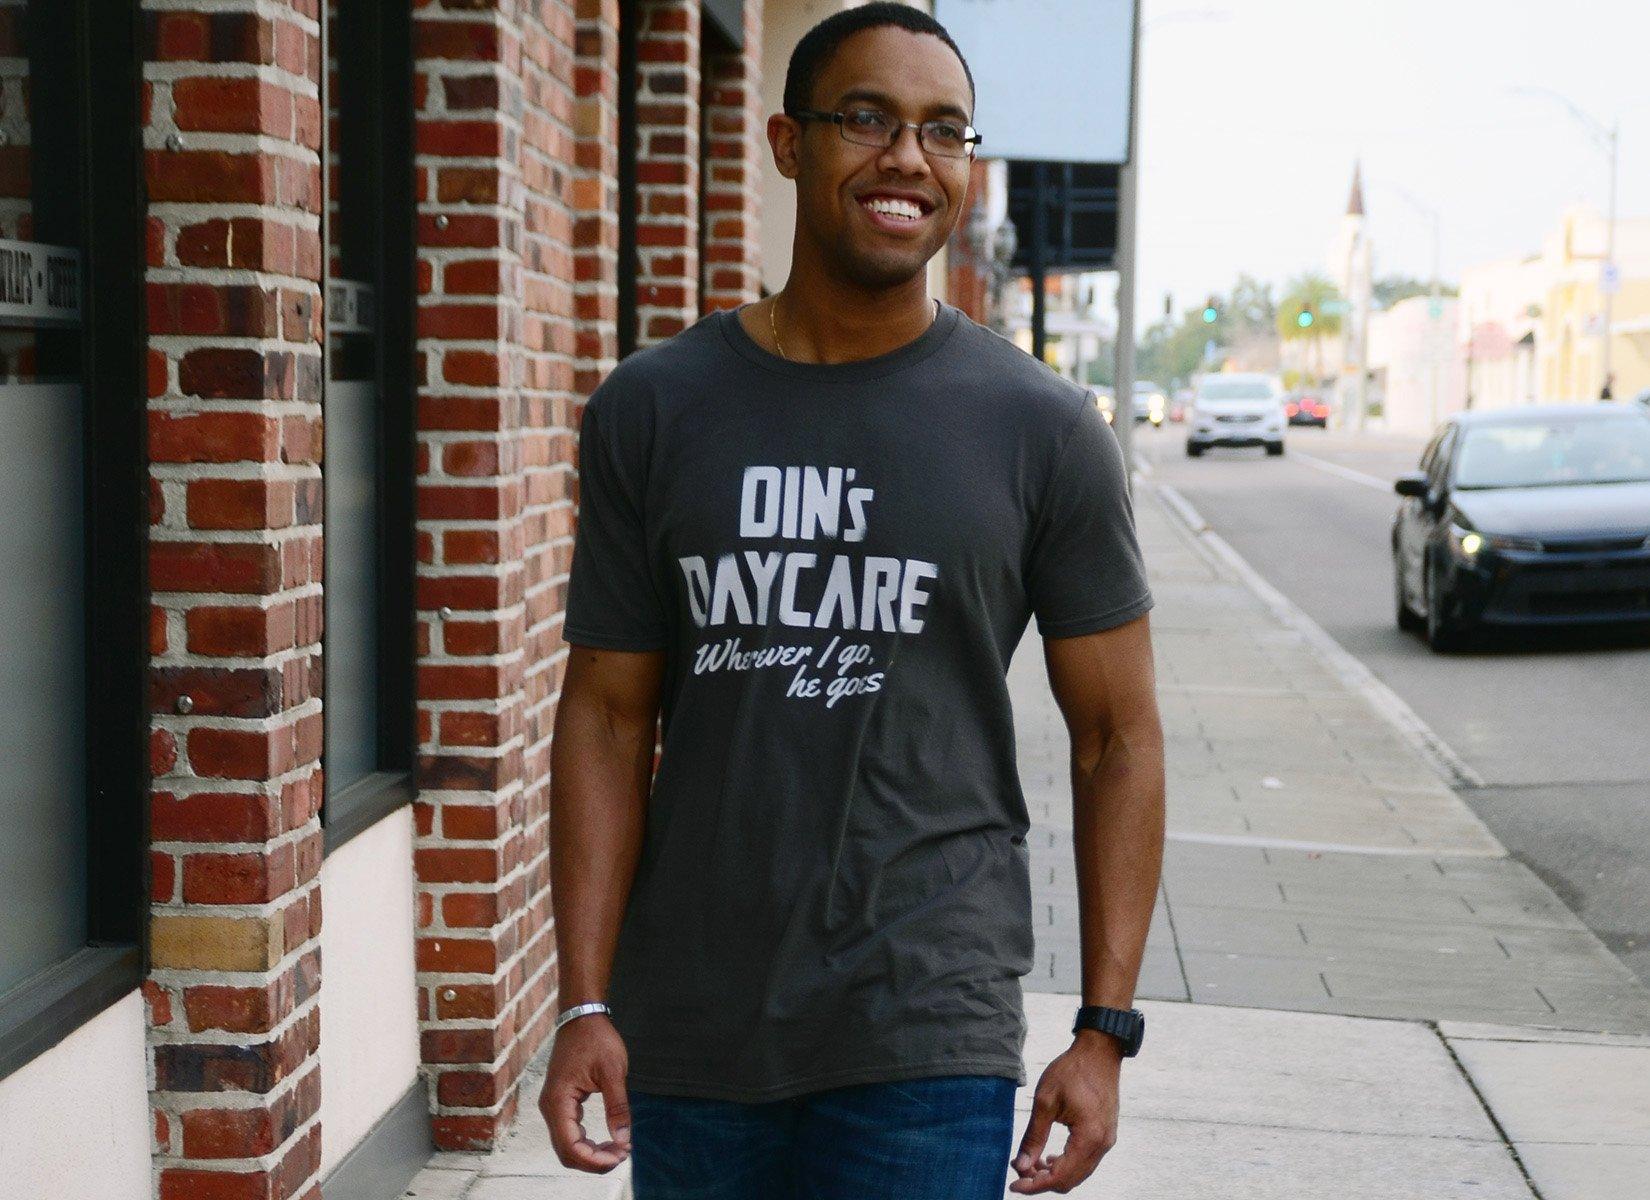 Din's Daycare on Mens T-Shirt